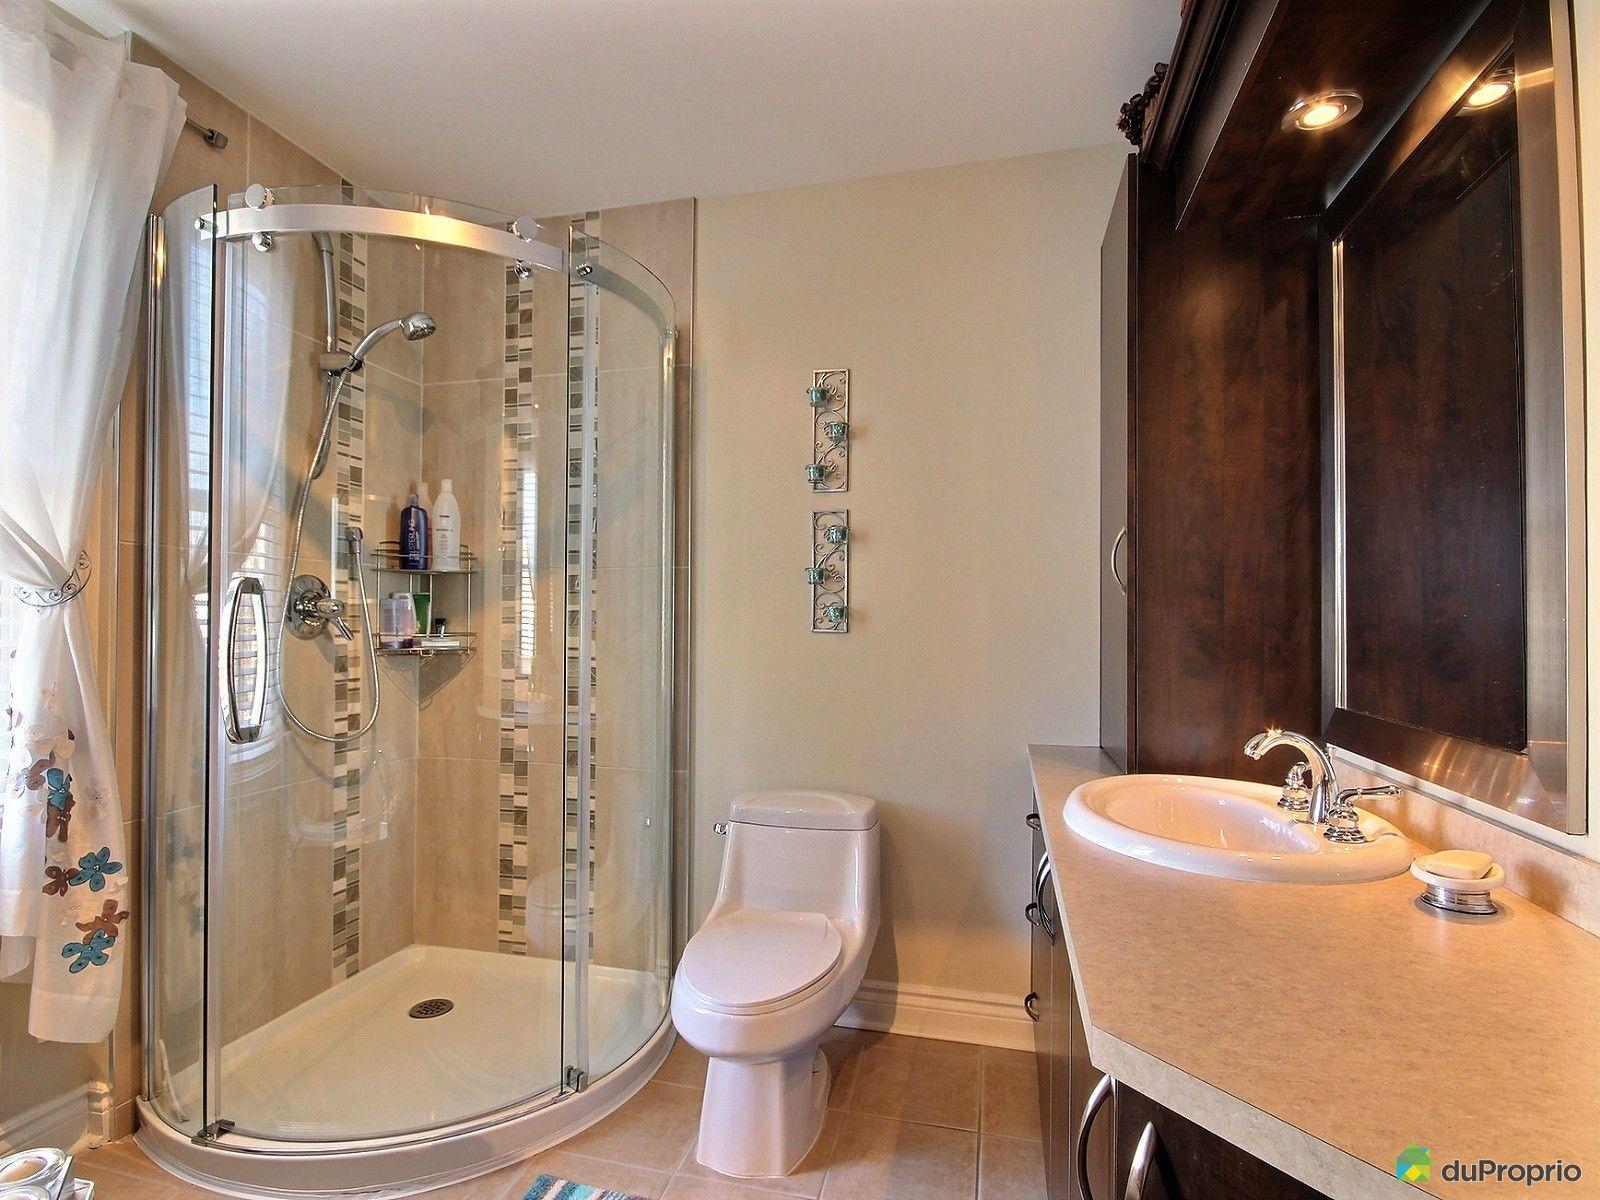 armoire salle de bain a vendre interesting meuble salle de bain with armoire salle de bain a. Black Bedroom Furniture Sets. Home Design Ideas